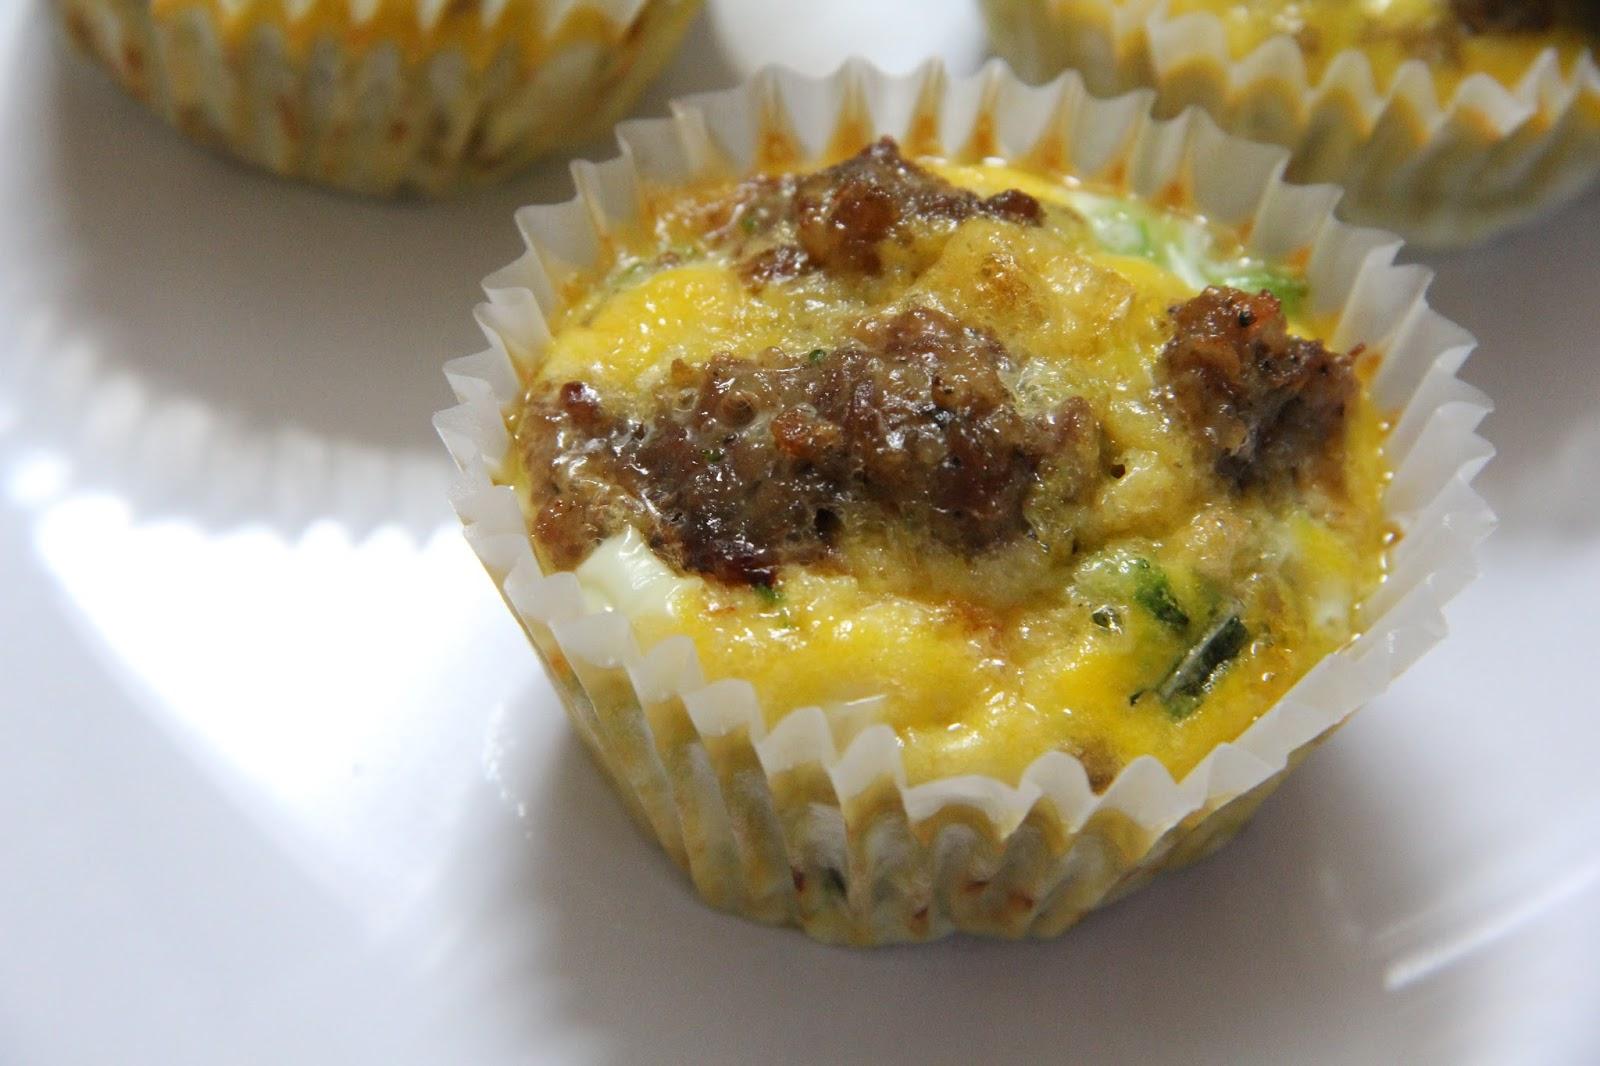 how to make eggs like mcdonalds big breakfast